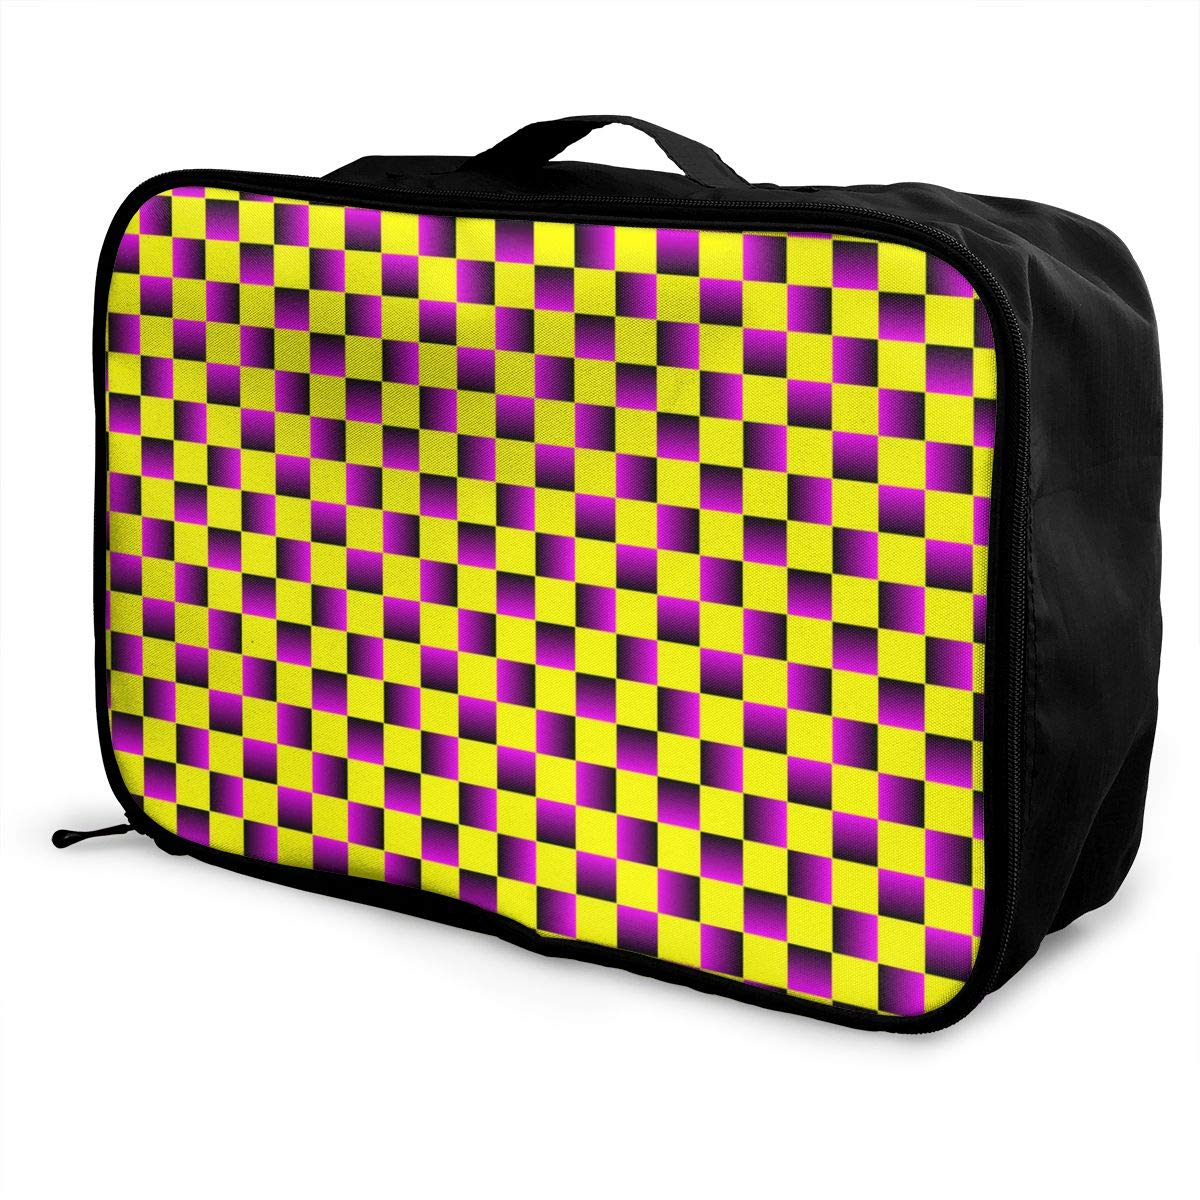 Women /& Men Foldable Travel Duffel Bag Lattice Pattern Wave For Luggage Gym Sports